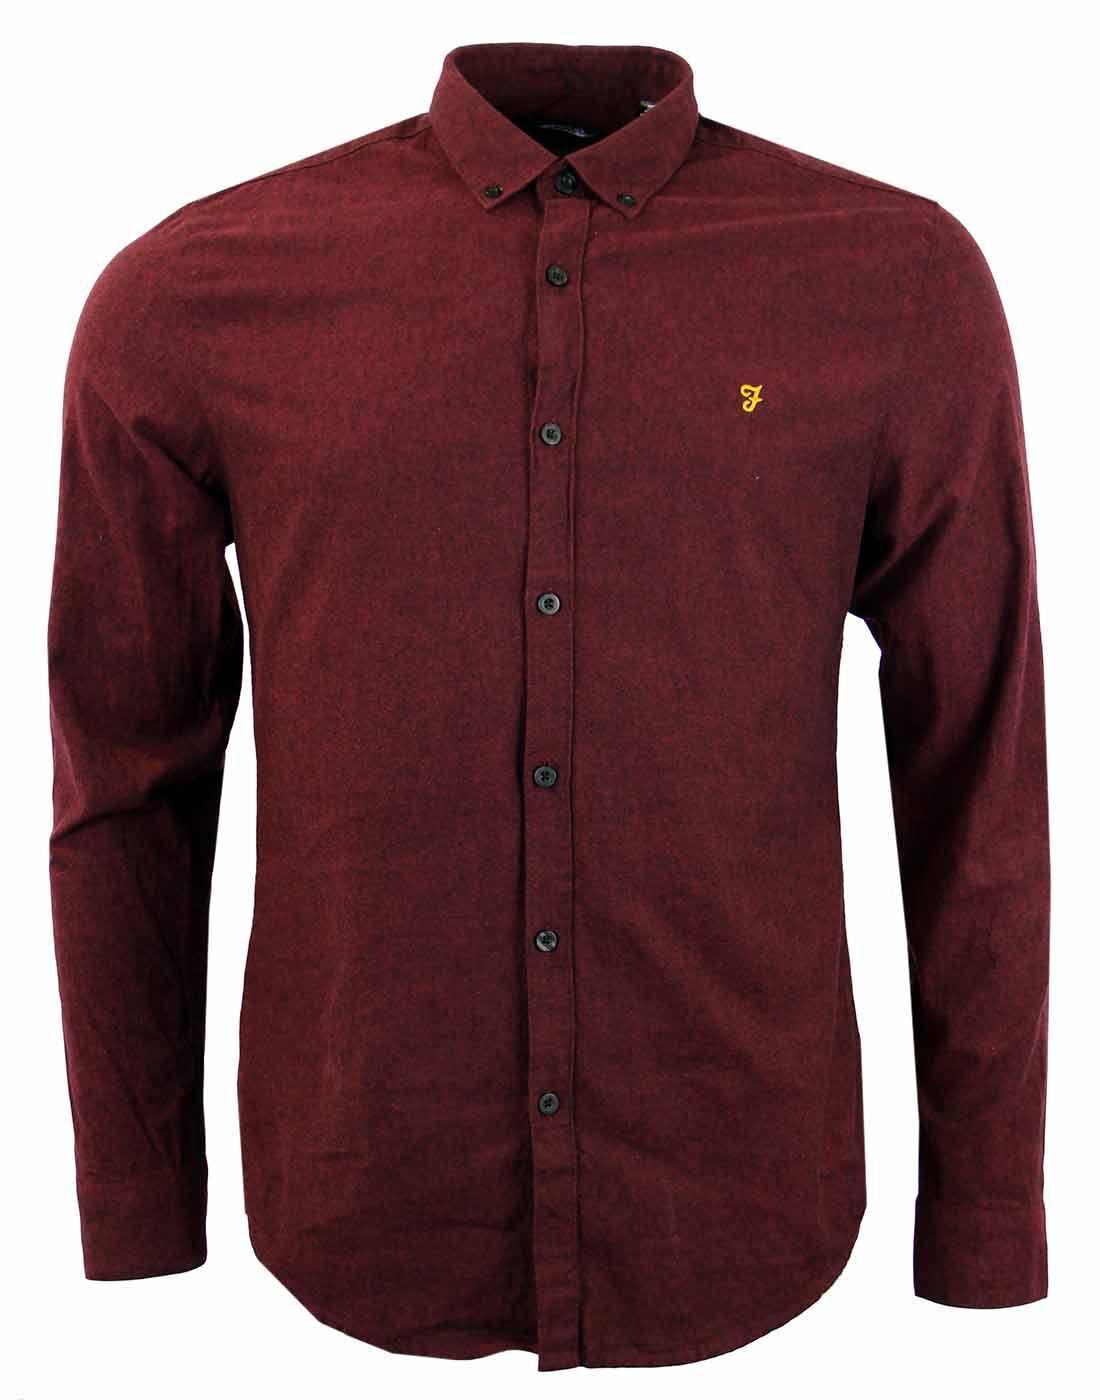 Steen FARAH VINTAGE Mod Button Down Oxford Shirt